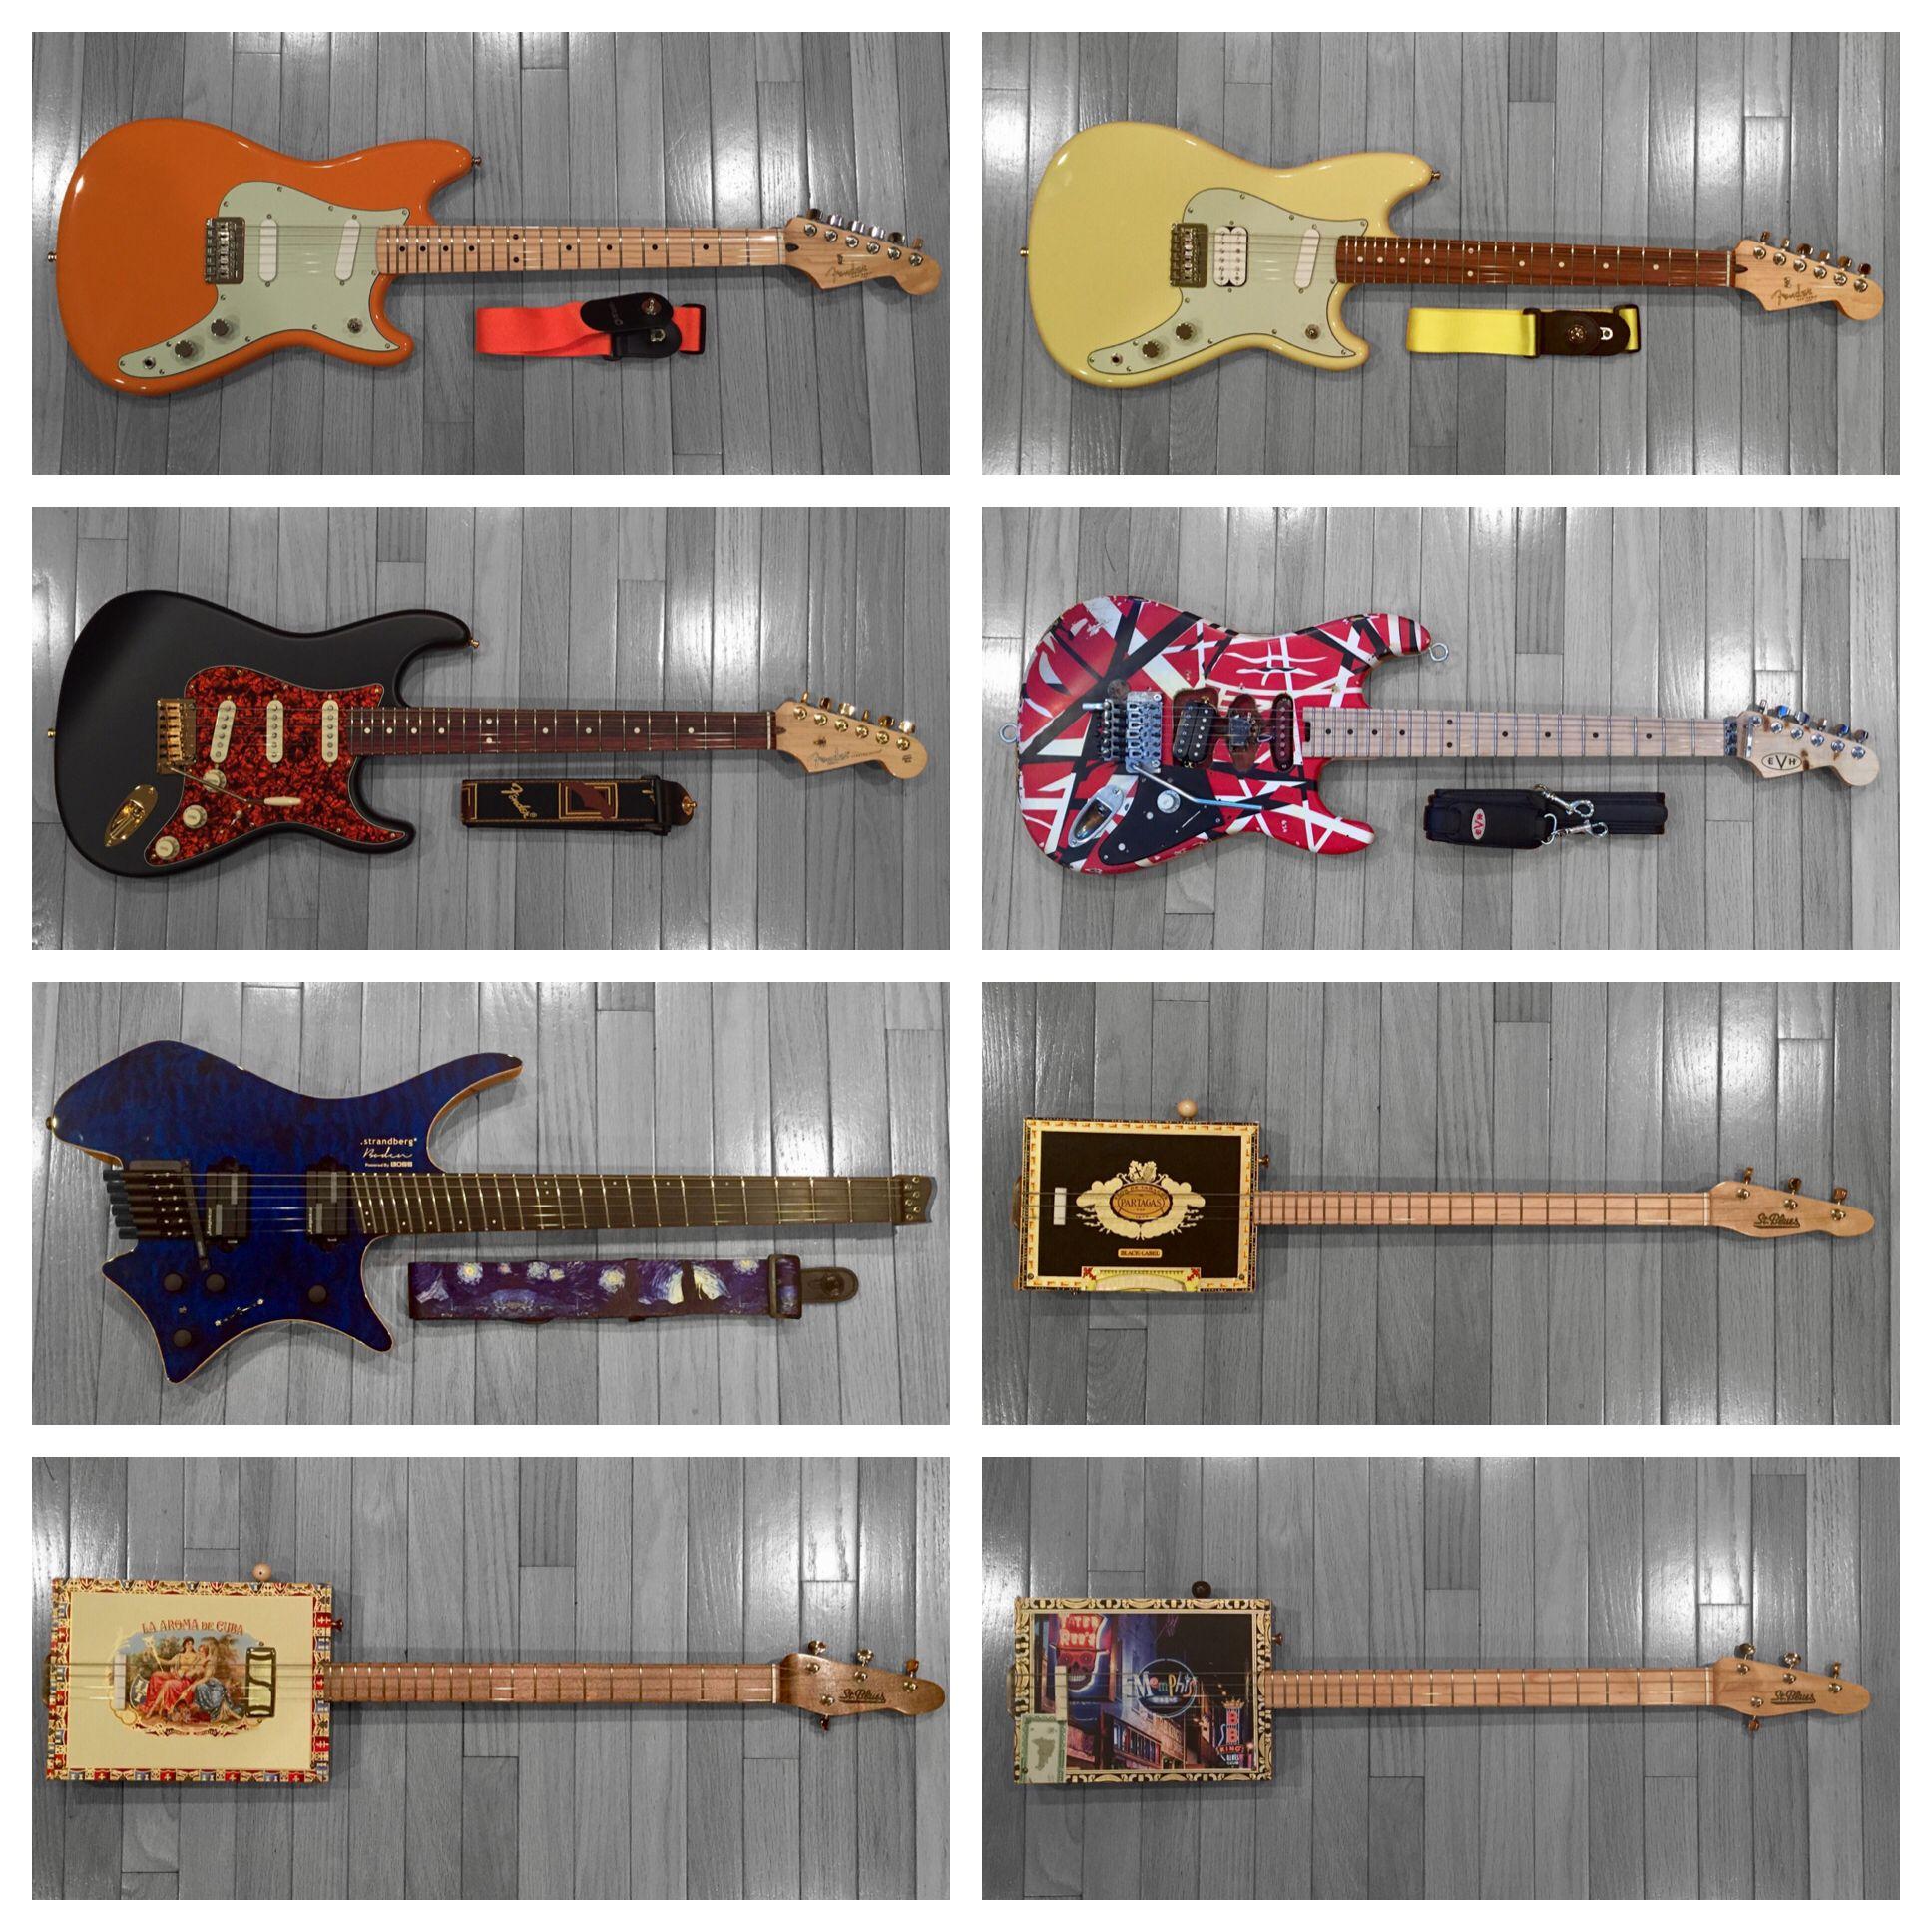 Fender Duo-Sonic & Duo-Sonic HS, Fender Mod Shop